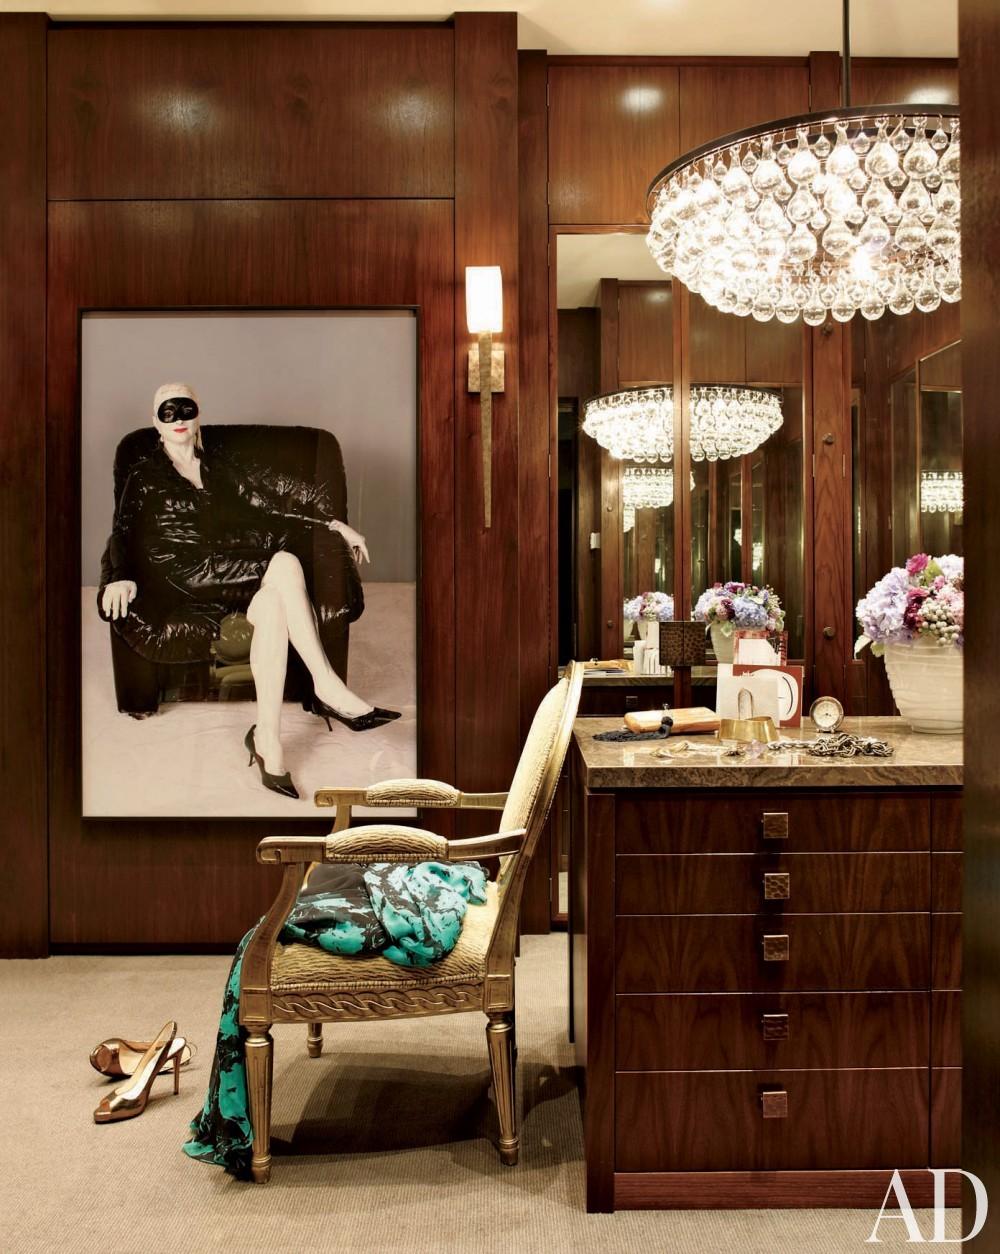 Contemporary Dressing Room by Furze Bard + Associates and Manuel J. Diaz in Jupiter, Florida